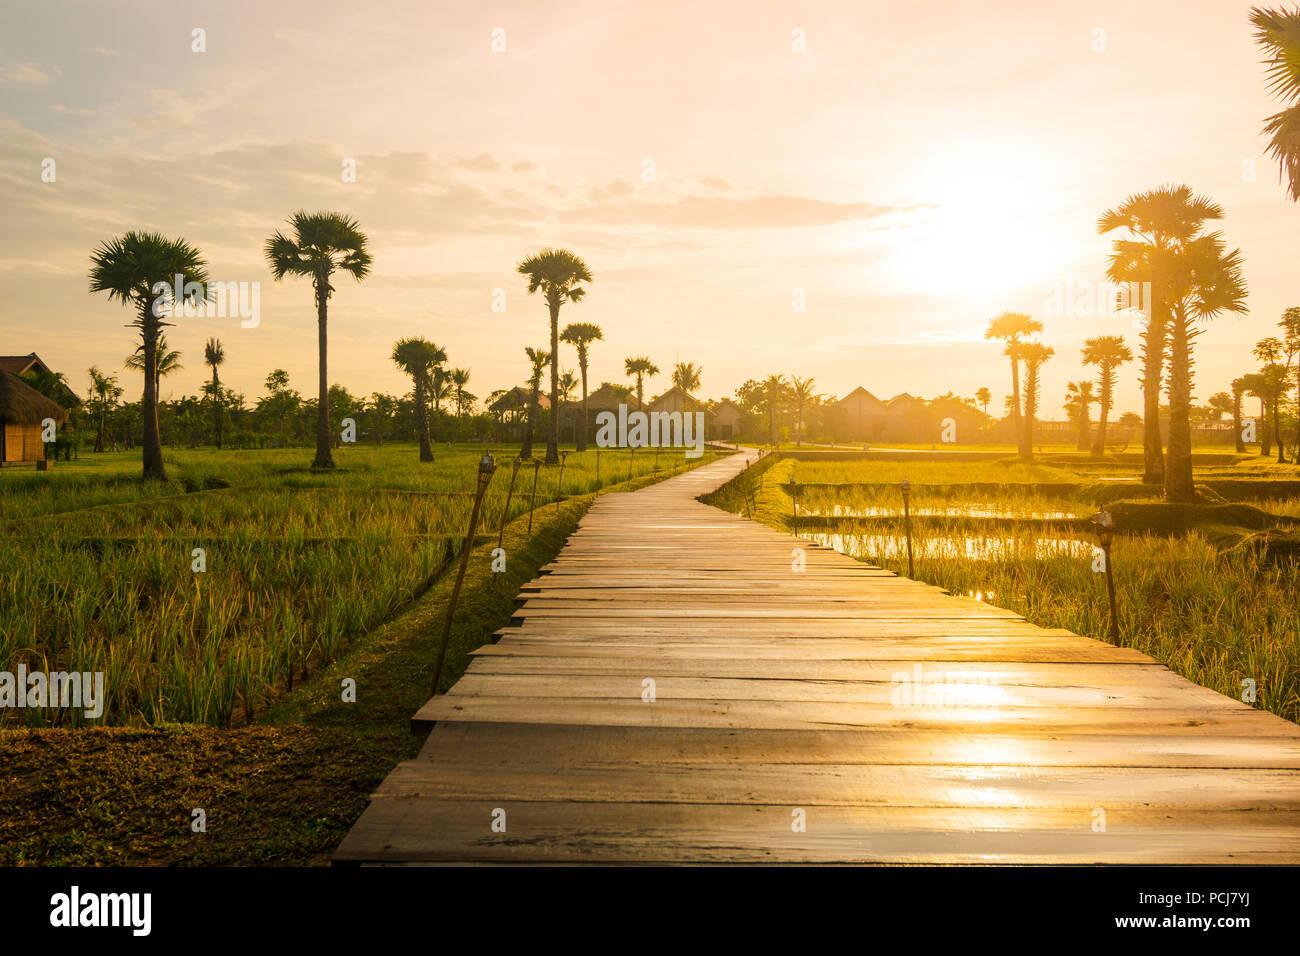 Holzterrasse Causeway Brücke durch Gras Feld und Palm Tree Plantation in Siem Reap (Angkor), Kambodscha. Stockbild